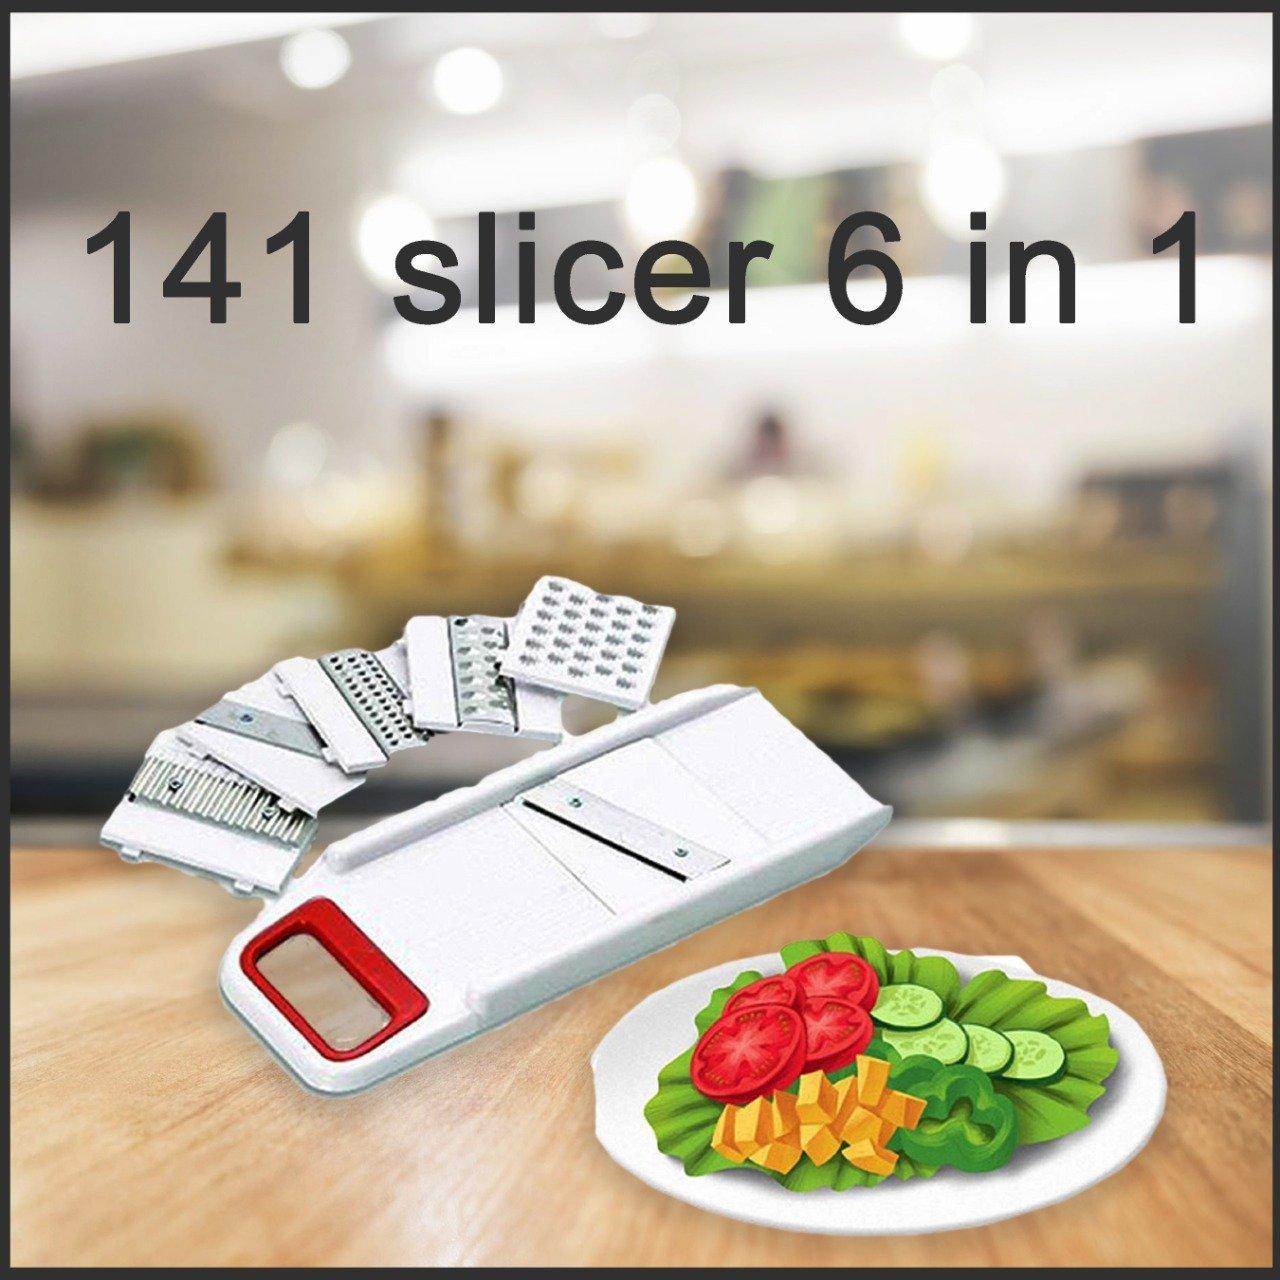 premium-vegetable-and-fruit-slicer-maker-multipurpose-6-in-1-vegetable-fruit-slicer-1-slicer-with-6-blades